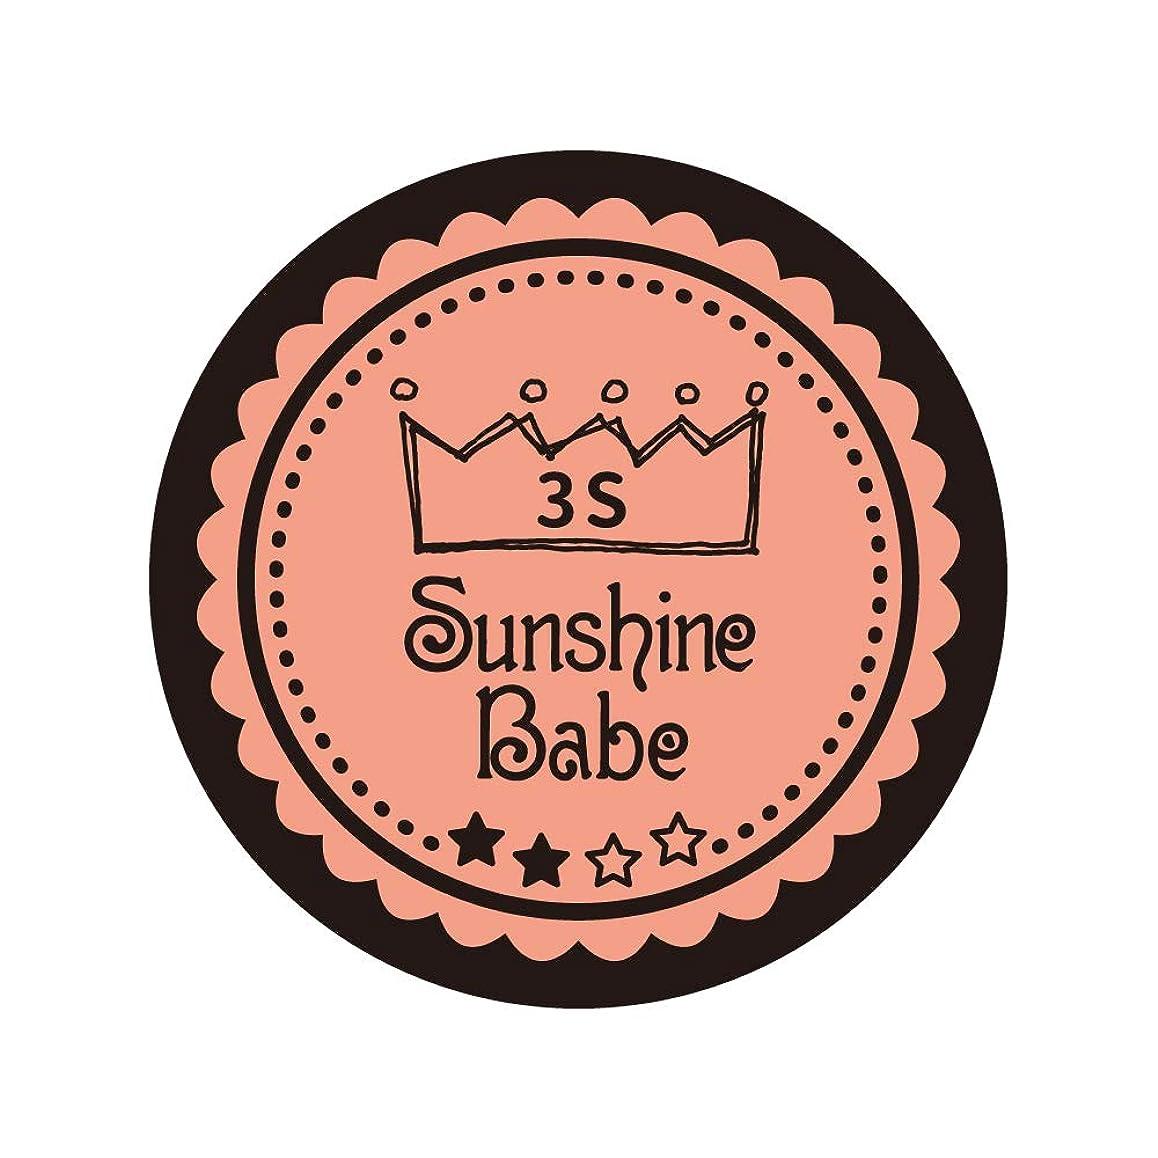 Sunshine Babe コスメティックカラー 3S ブルーミングダリア 4g UV/LED対応